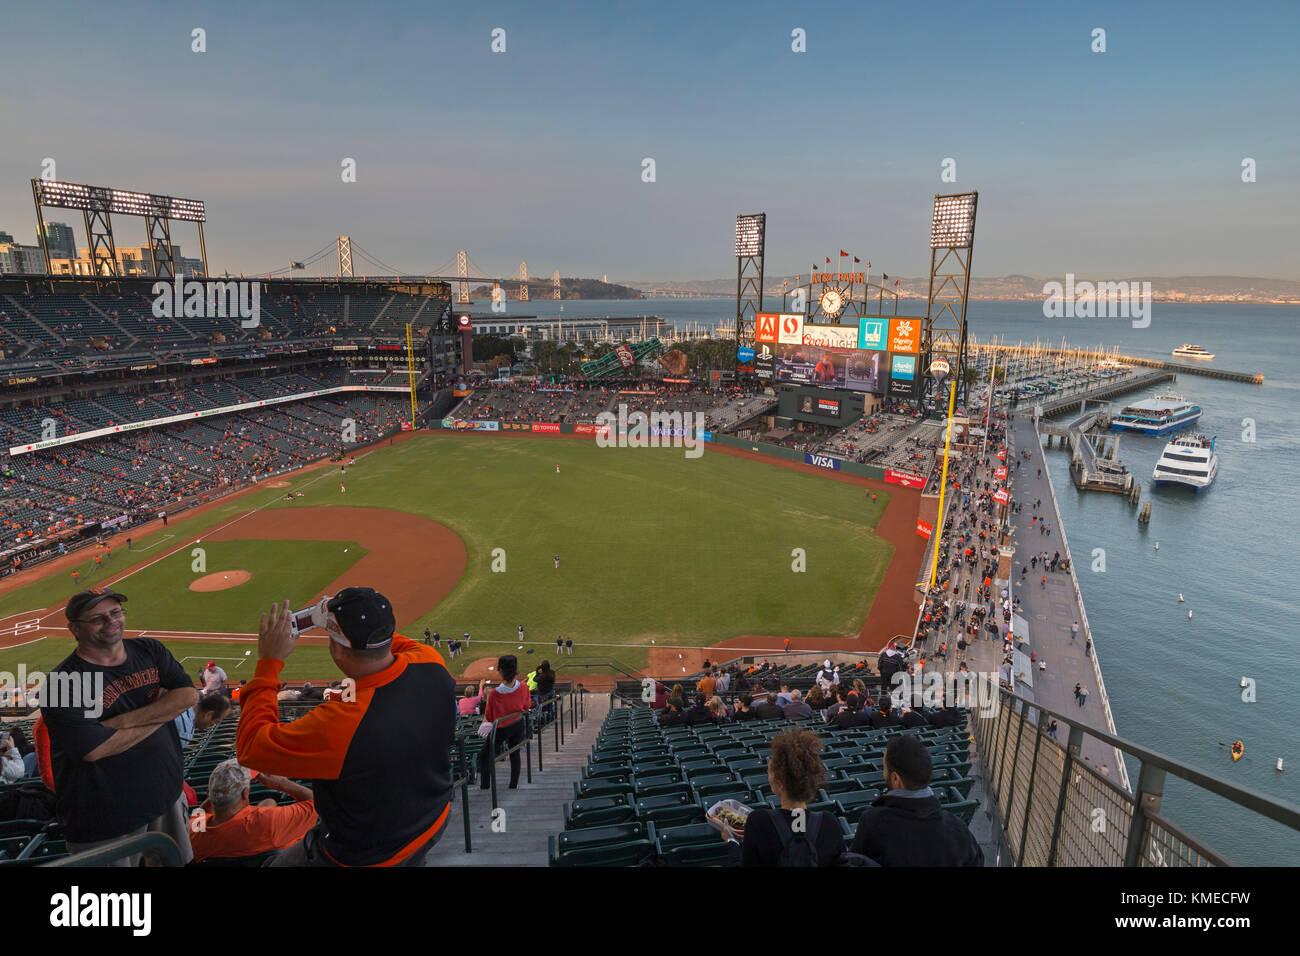 Att ballpark, casa di San Francisco Giants squadra di baseball di San Francisco, California, Stati Uniti d'America Immagini Stock